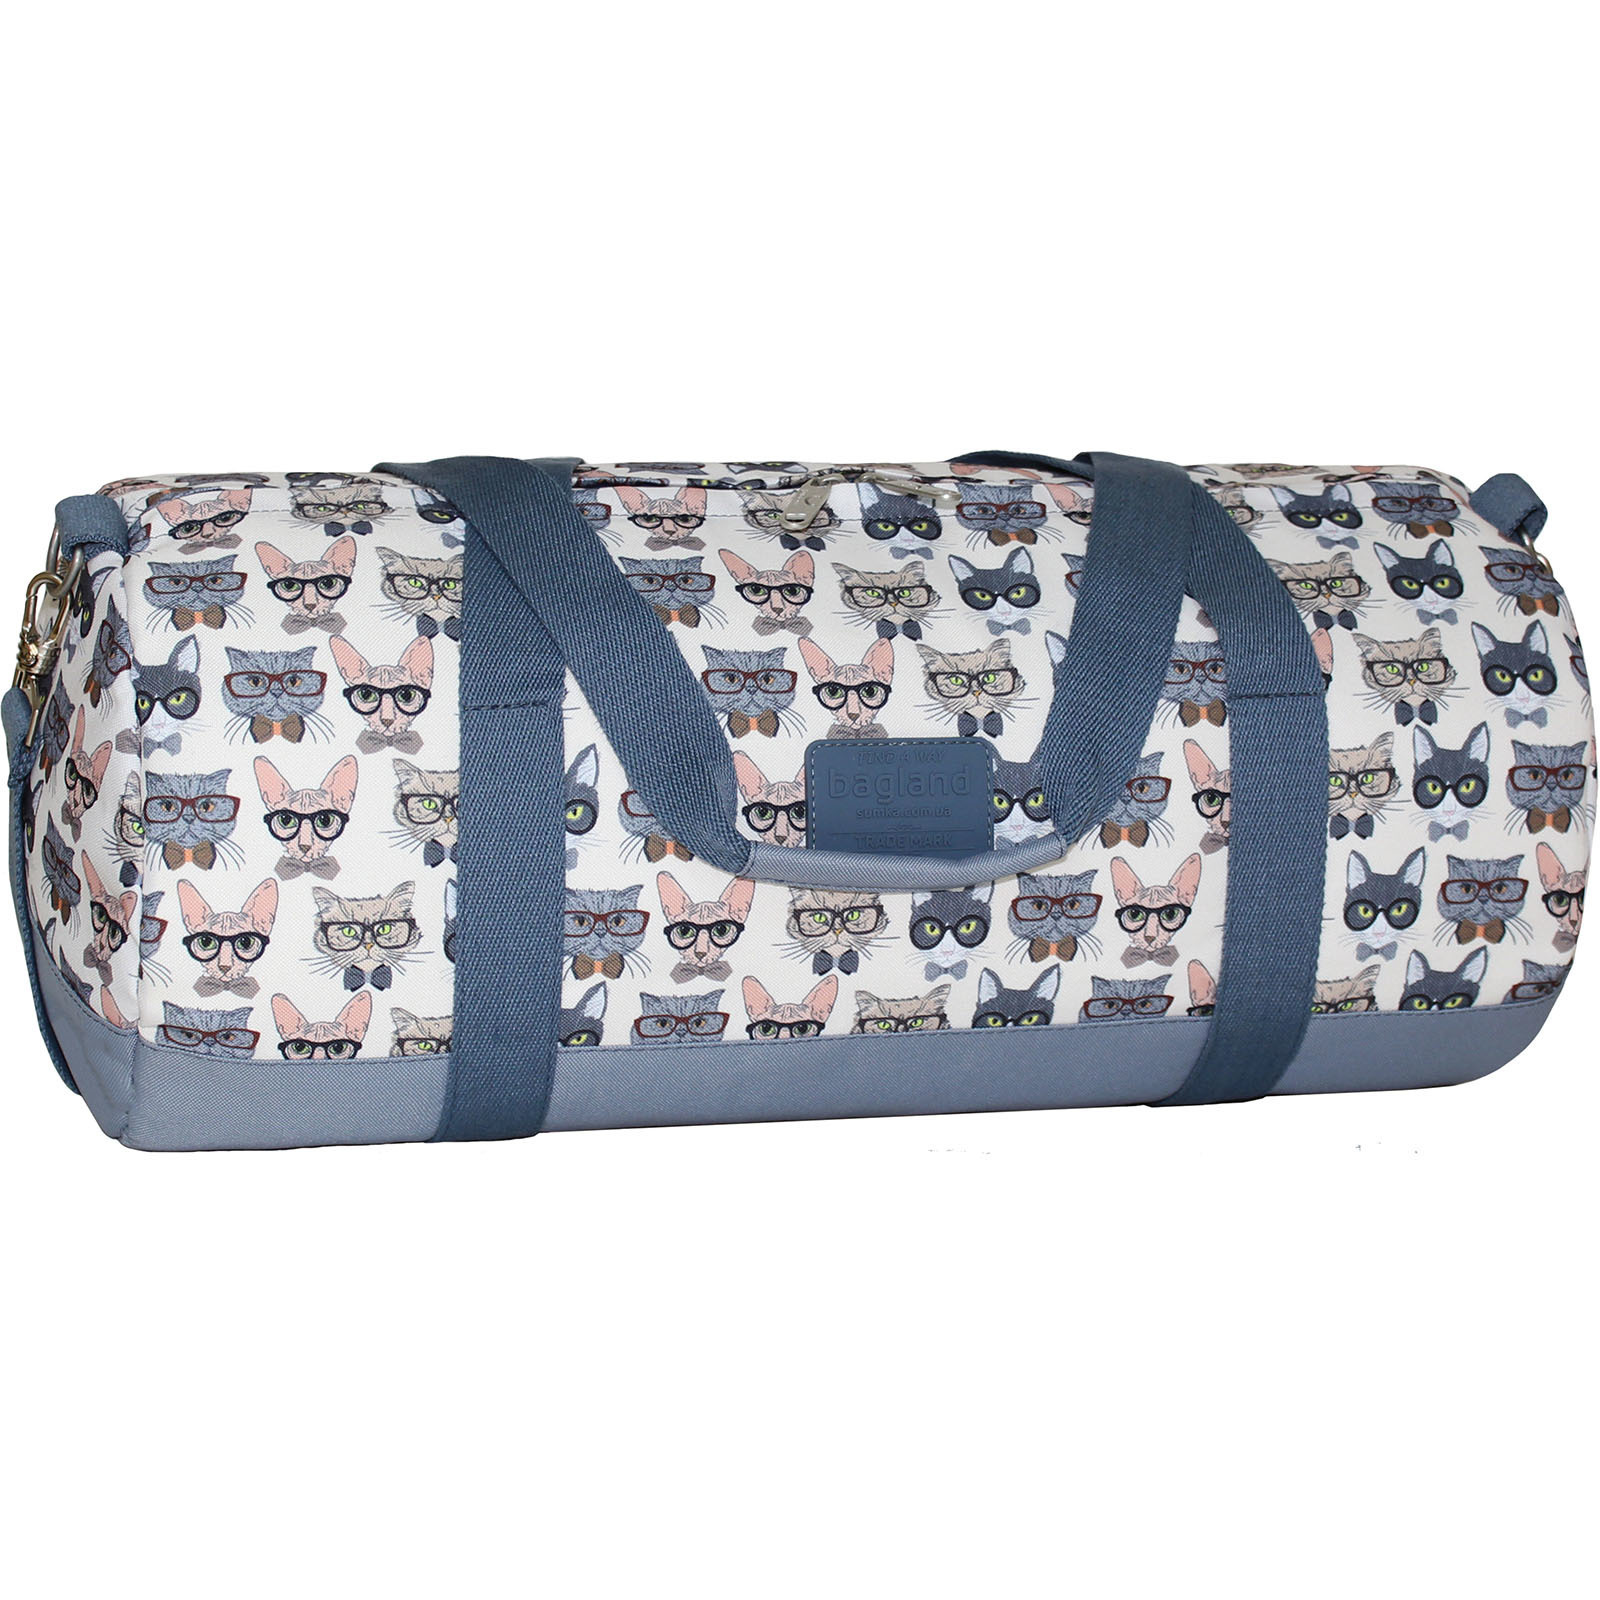 Спортивные сумки Сумка Bagland Staff 30 л. сублімація 28 (00300664) IMG_5078.JPG